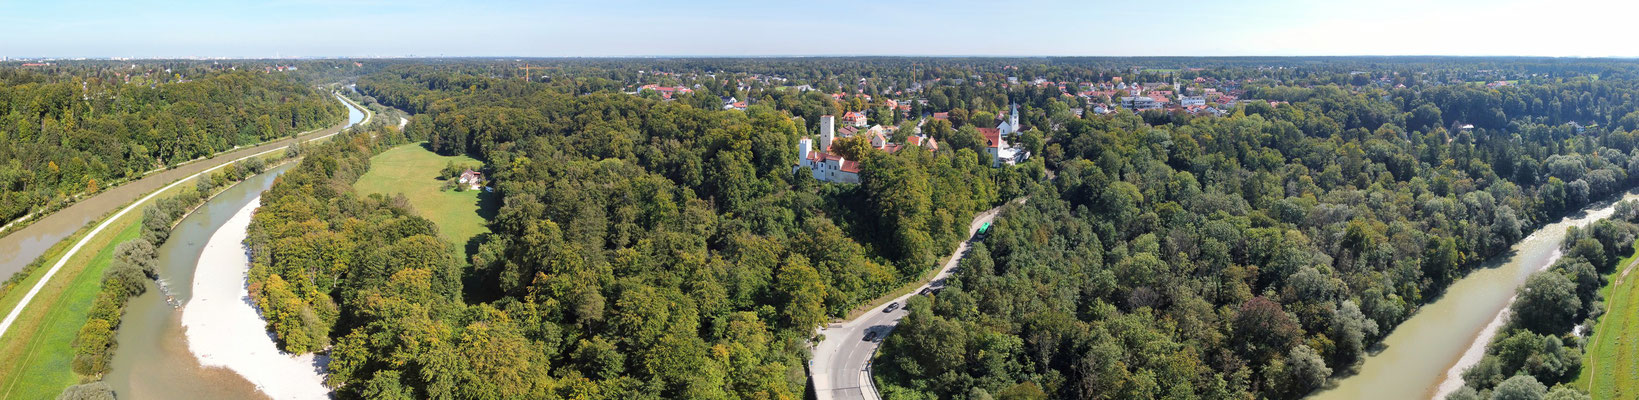 Panorama, Drohnenfotografie, Grünwald, Brücke, Isar, Serpentin, Kanal, Wald, Burg